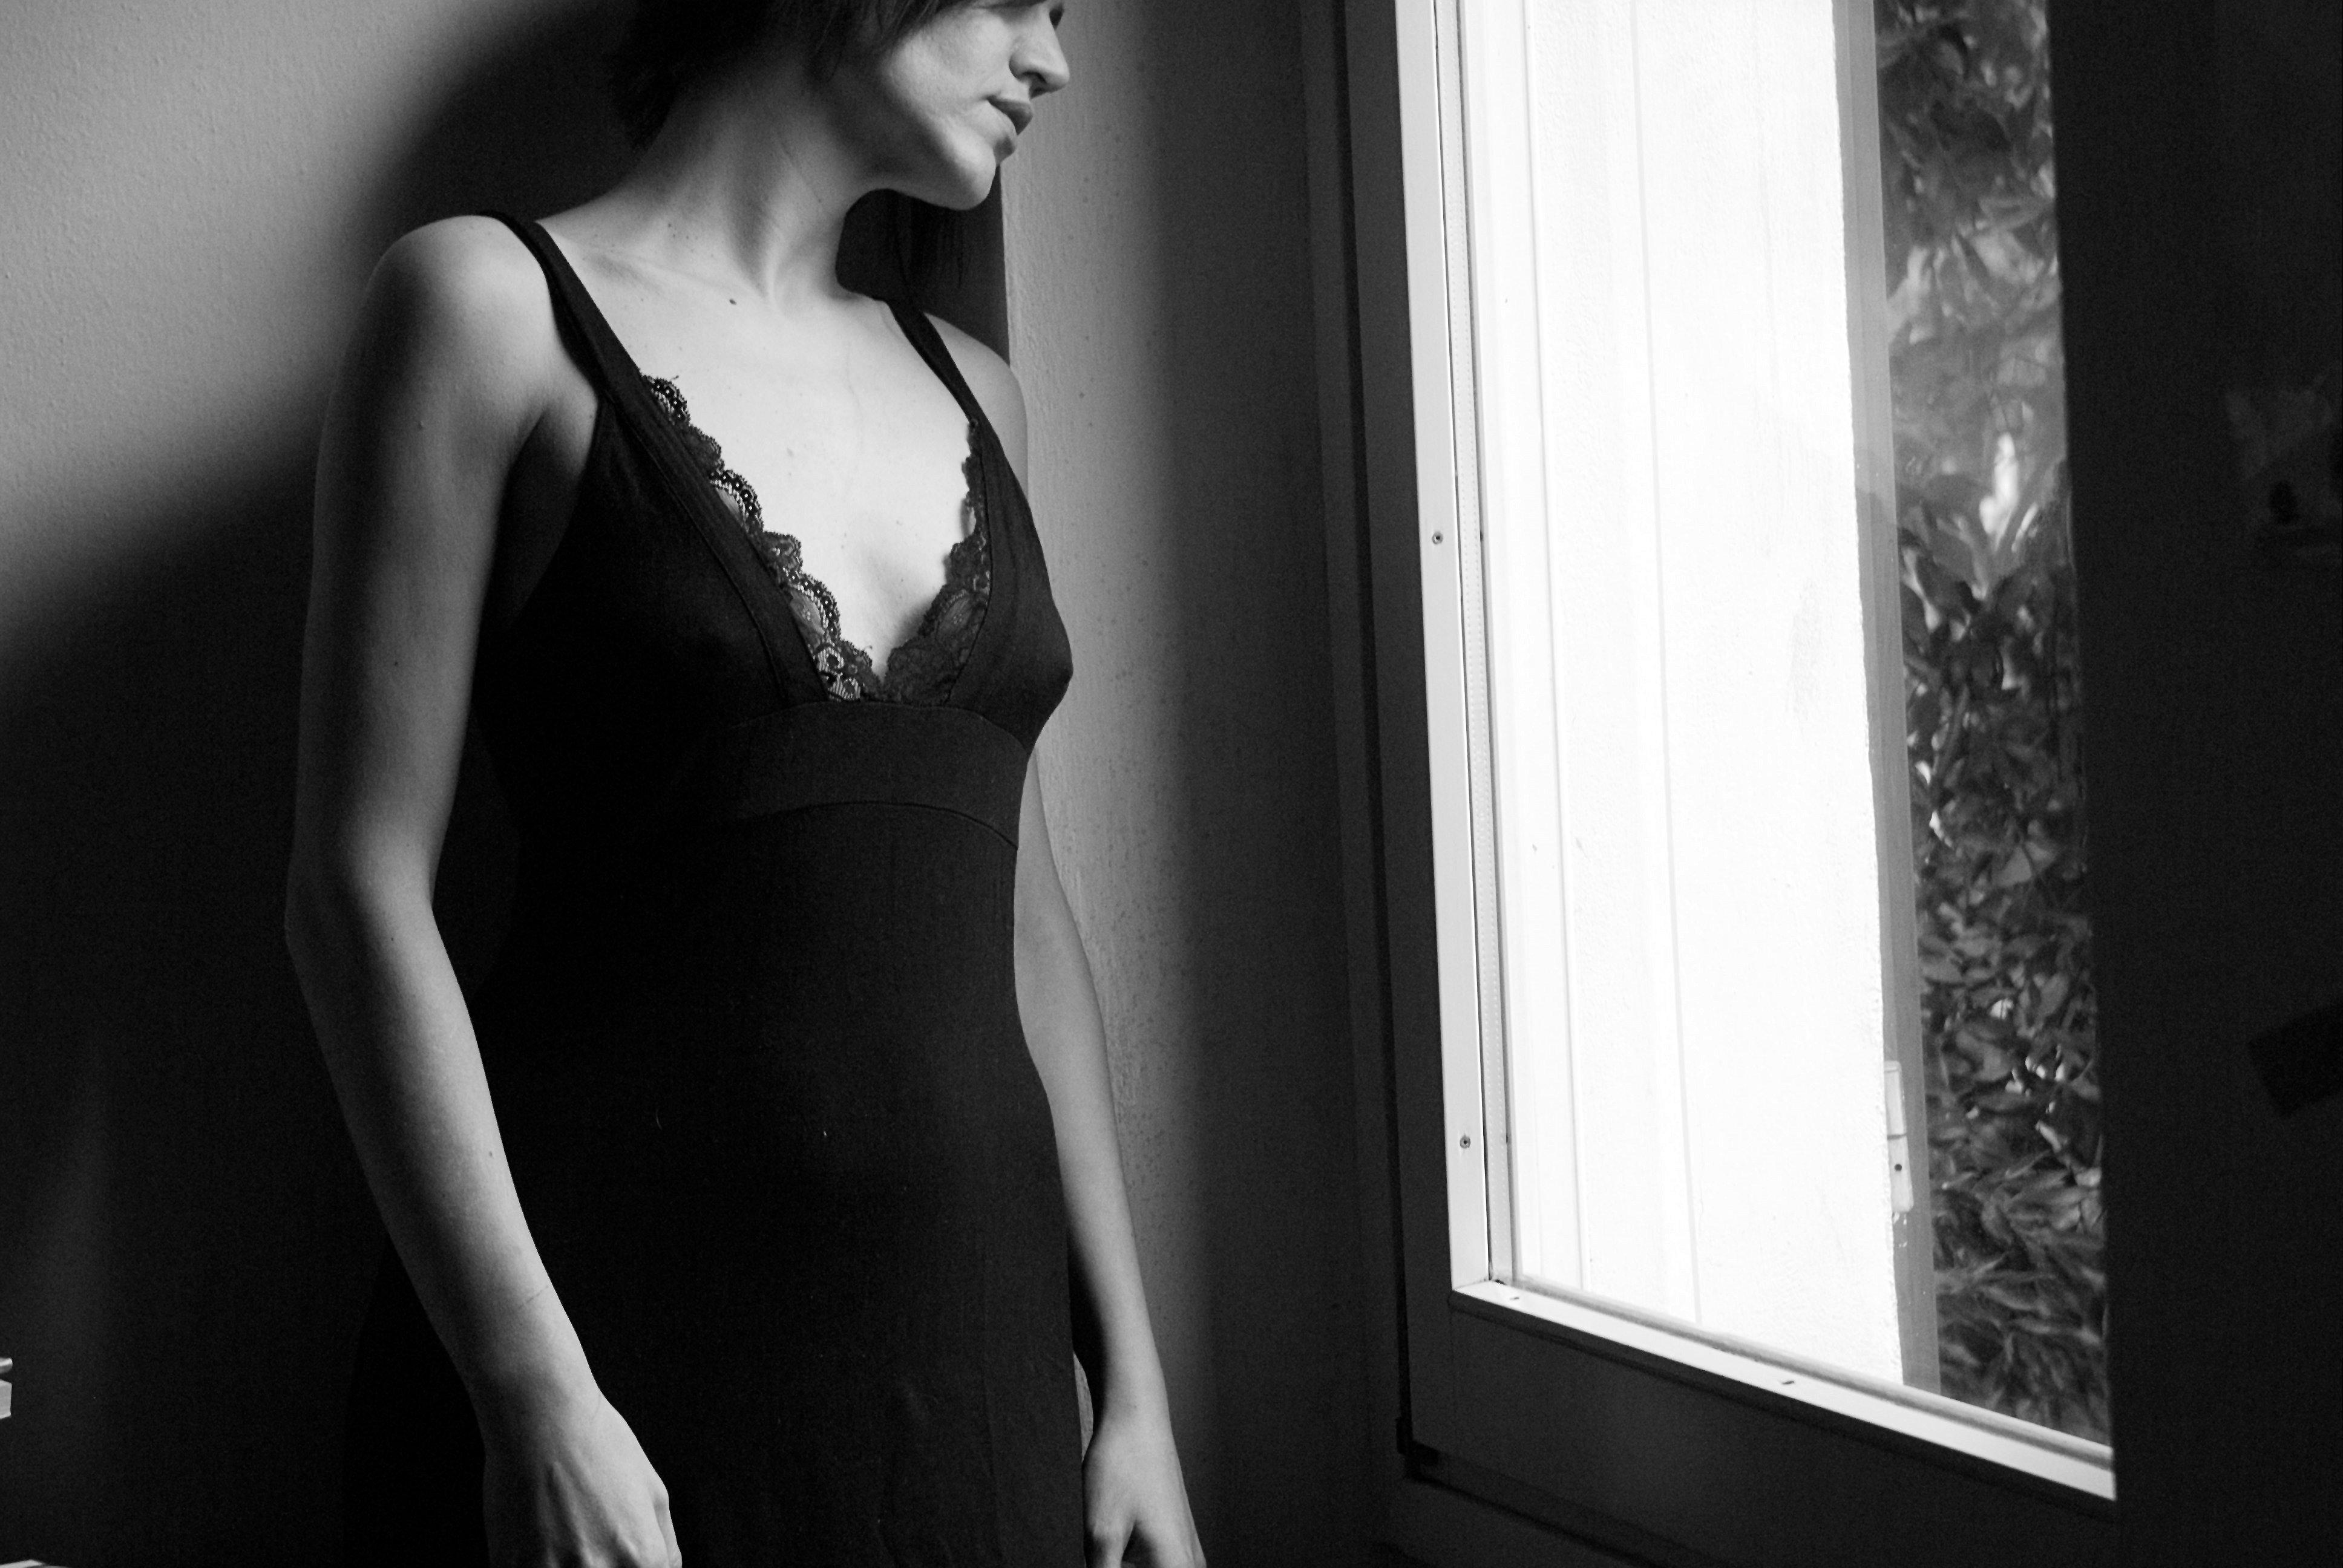 chiara_boschi_selfportrait